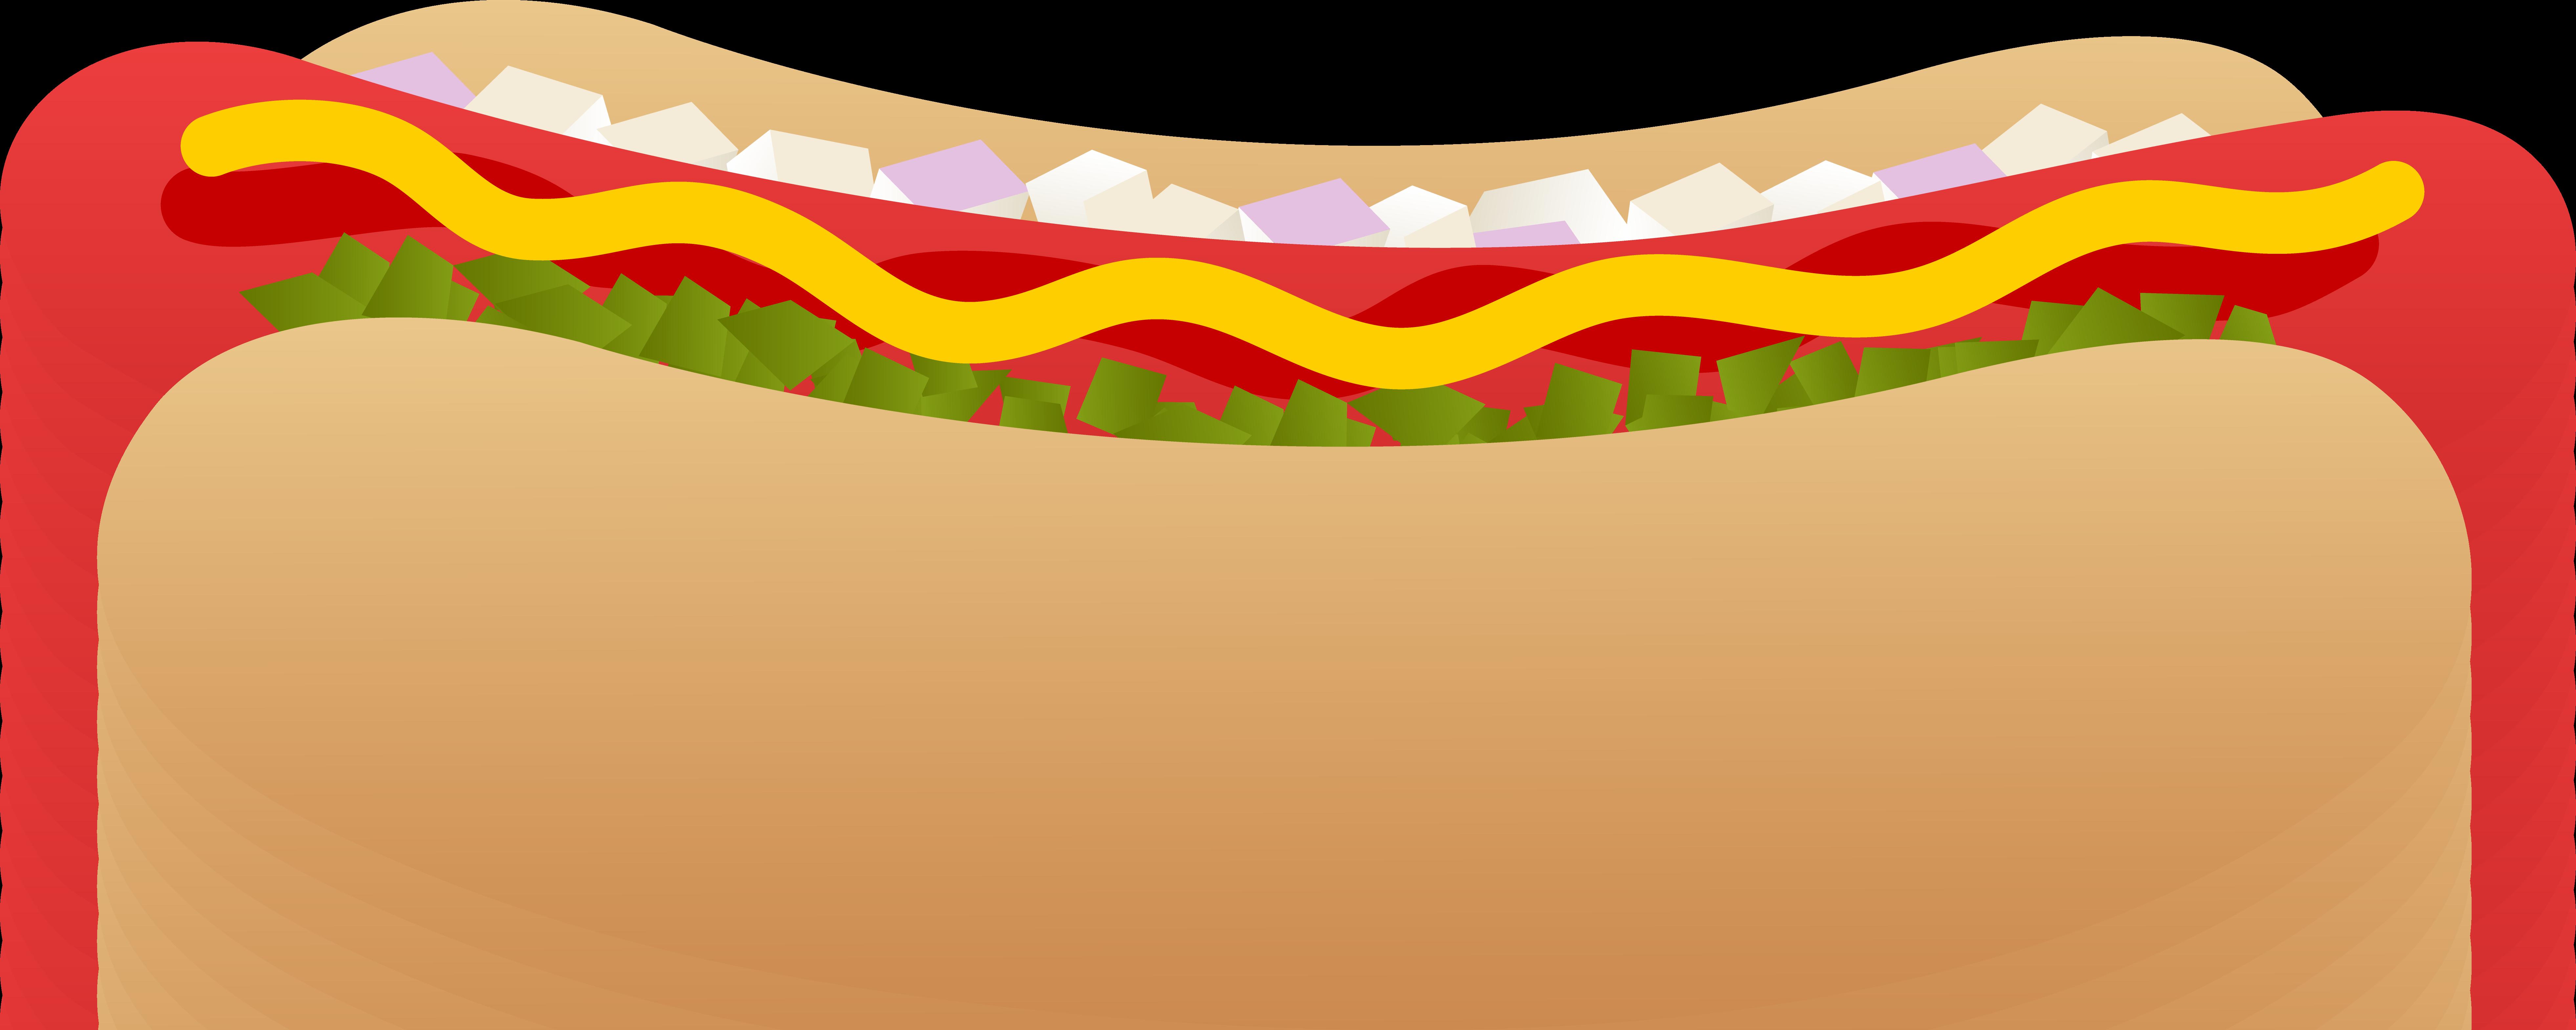 corrosion clipart u0026middot; hotdog clipart